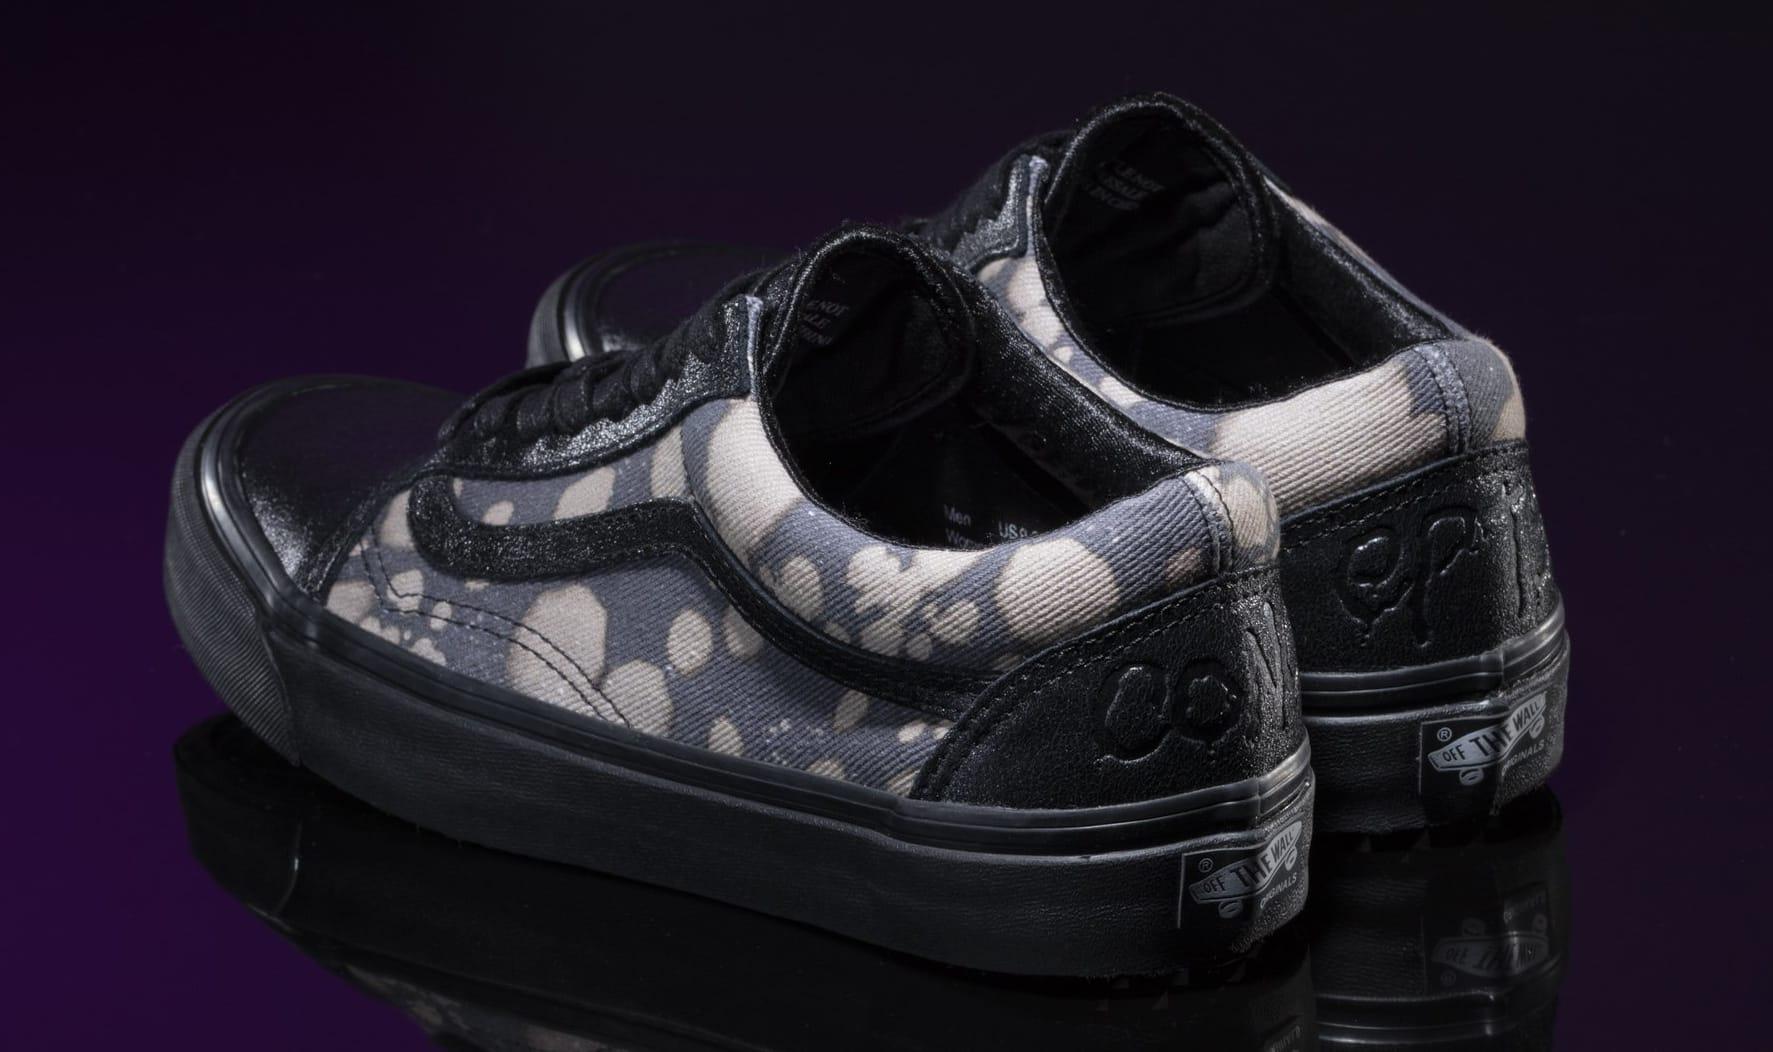 Concepts x Vans Old Skool 'Forty Deuce' (Heel)